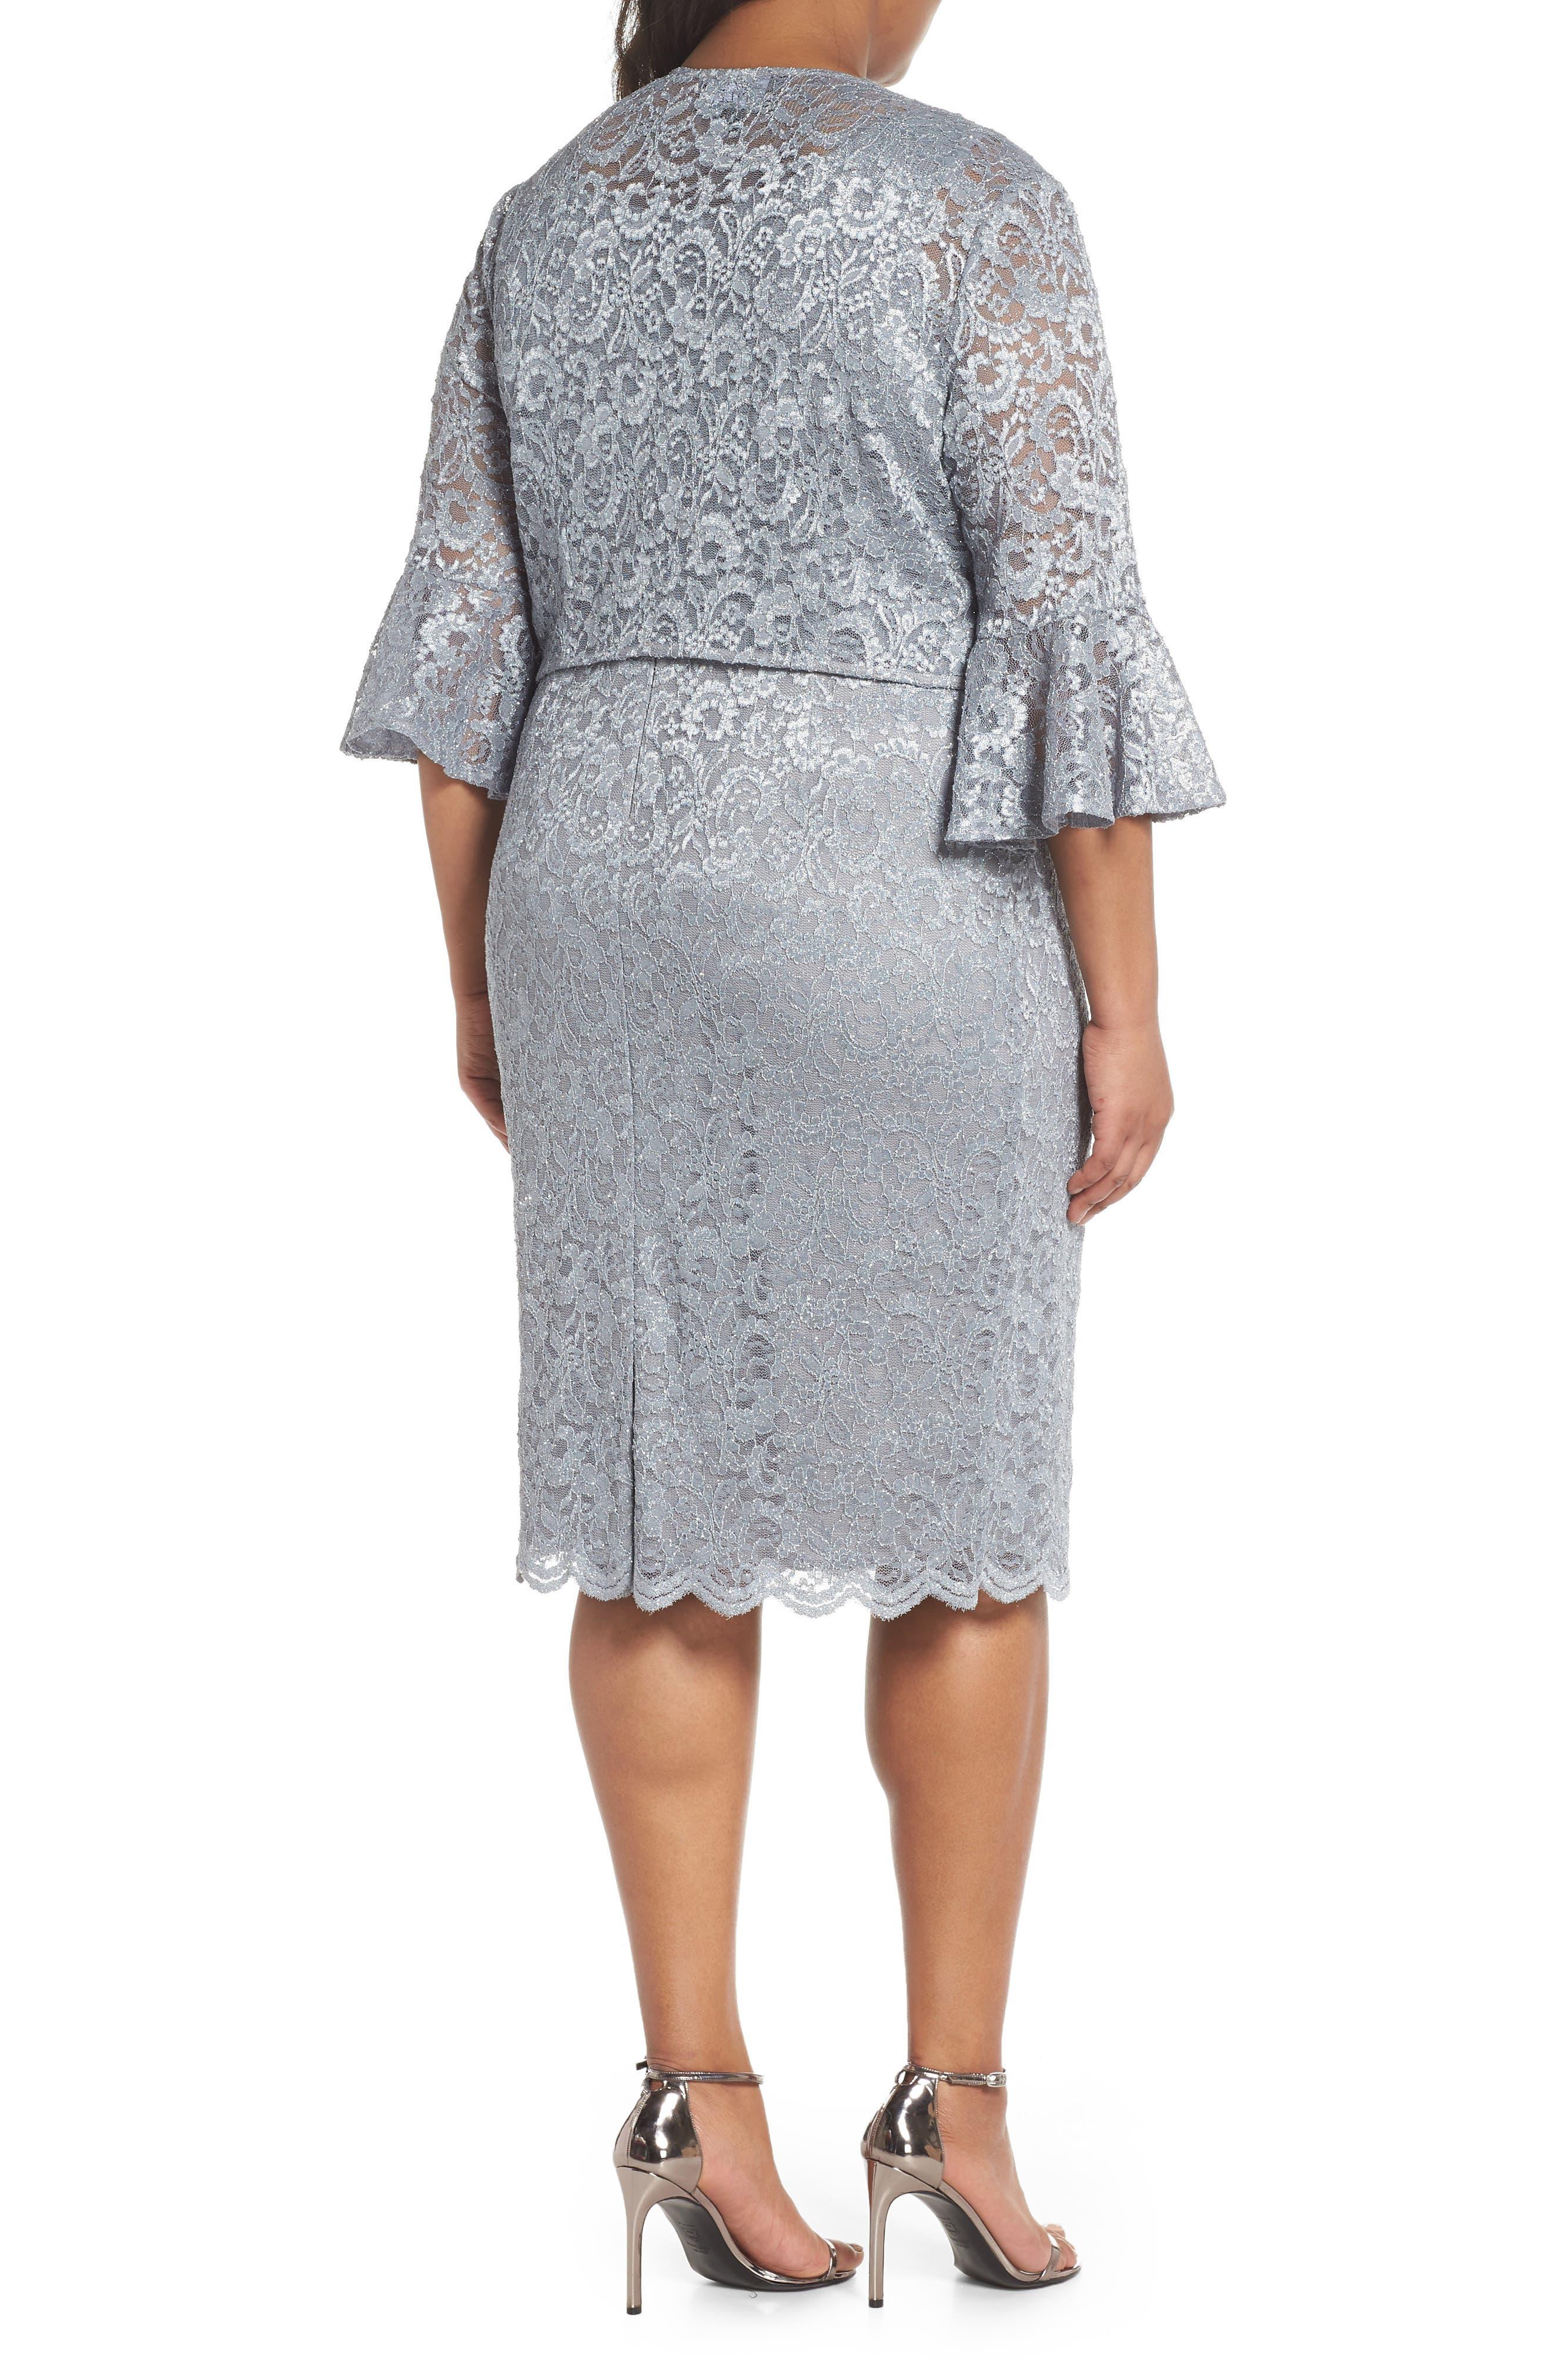 ALEX EVENINGS,                             Lace Sheath Dress with Bolero Jacket,                             Alternate thumbnail 2, color,                             040